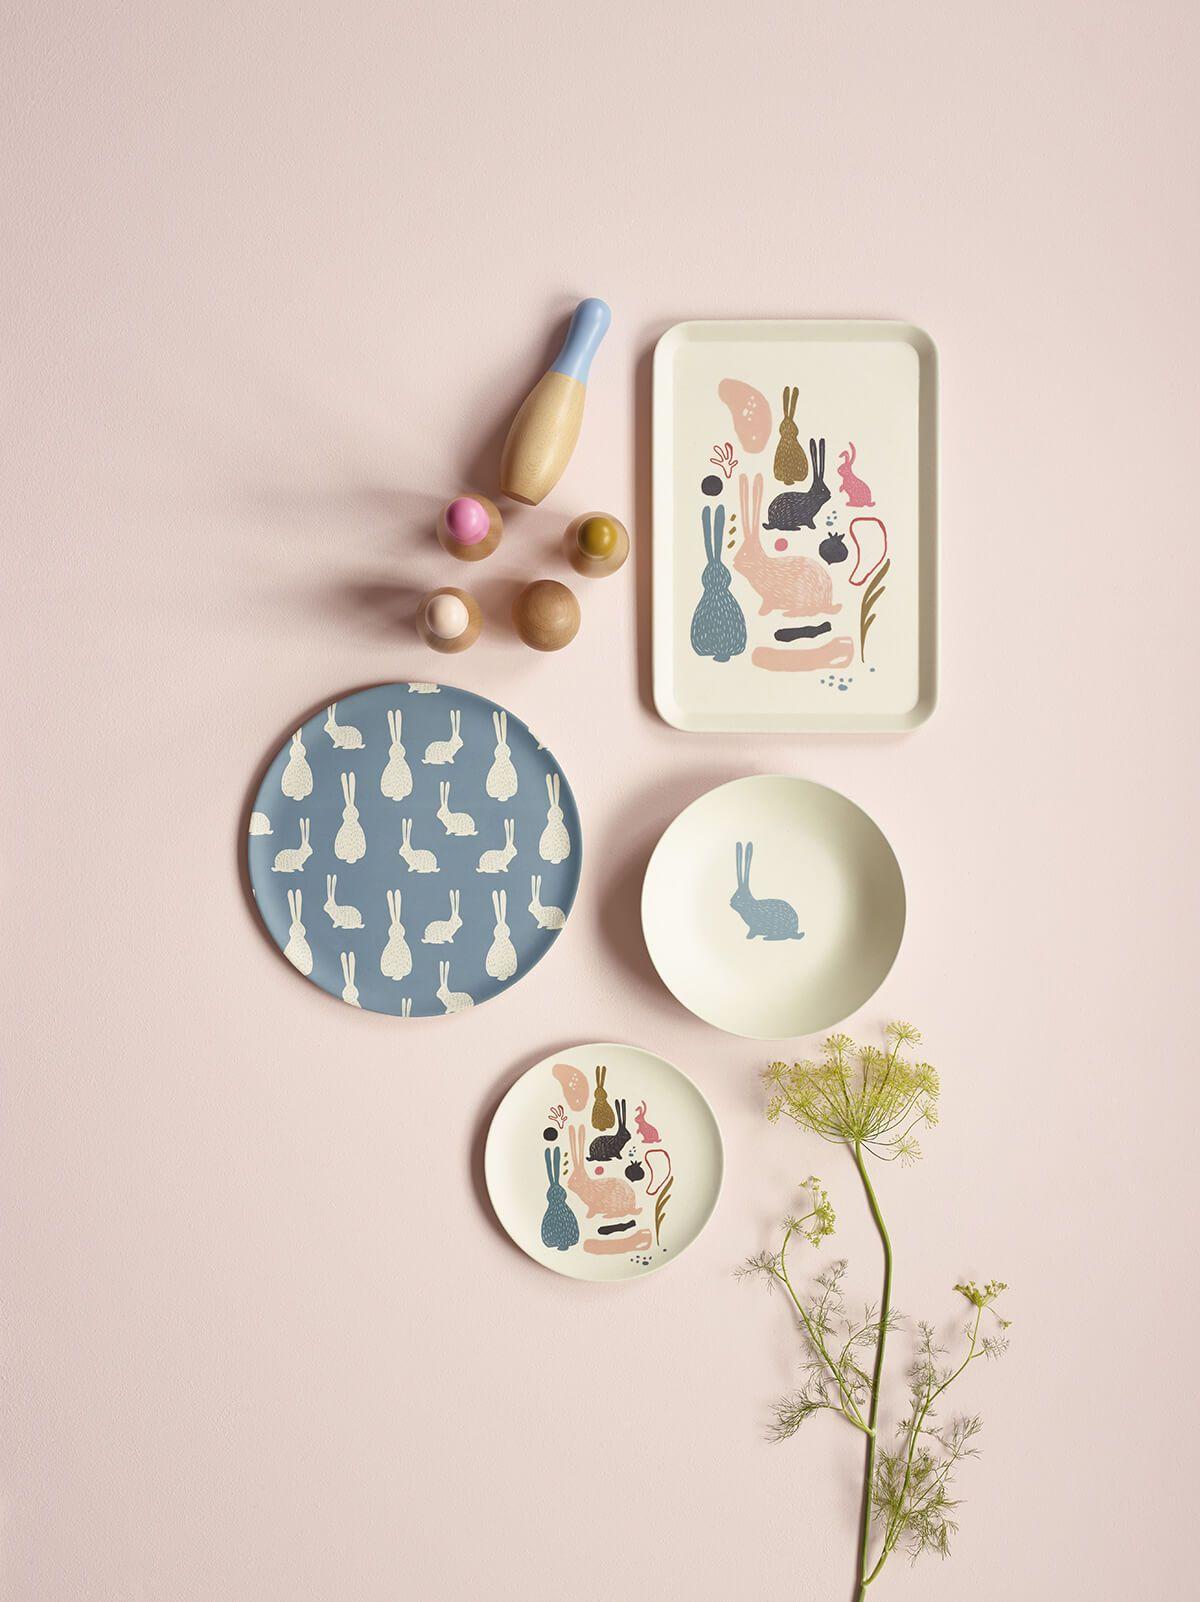 Kids Collection by Milk x Habitat | FrenchyFancy